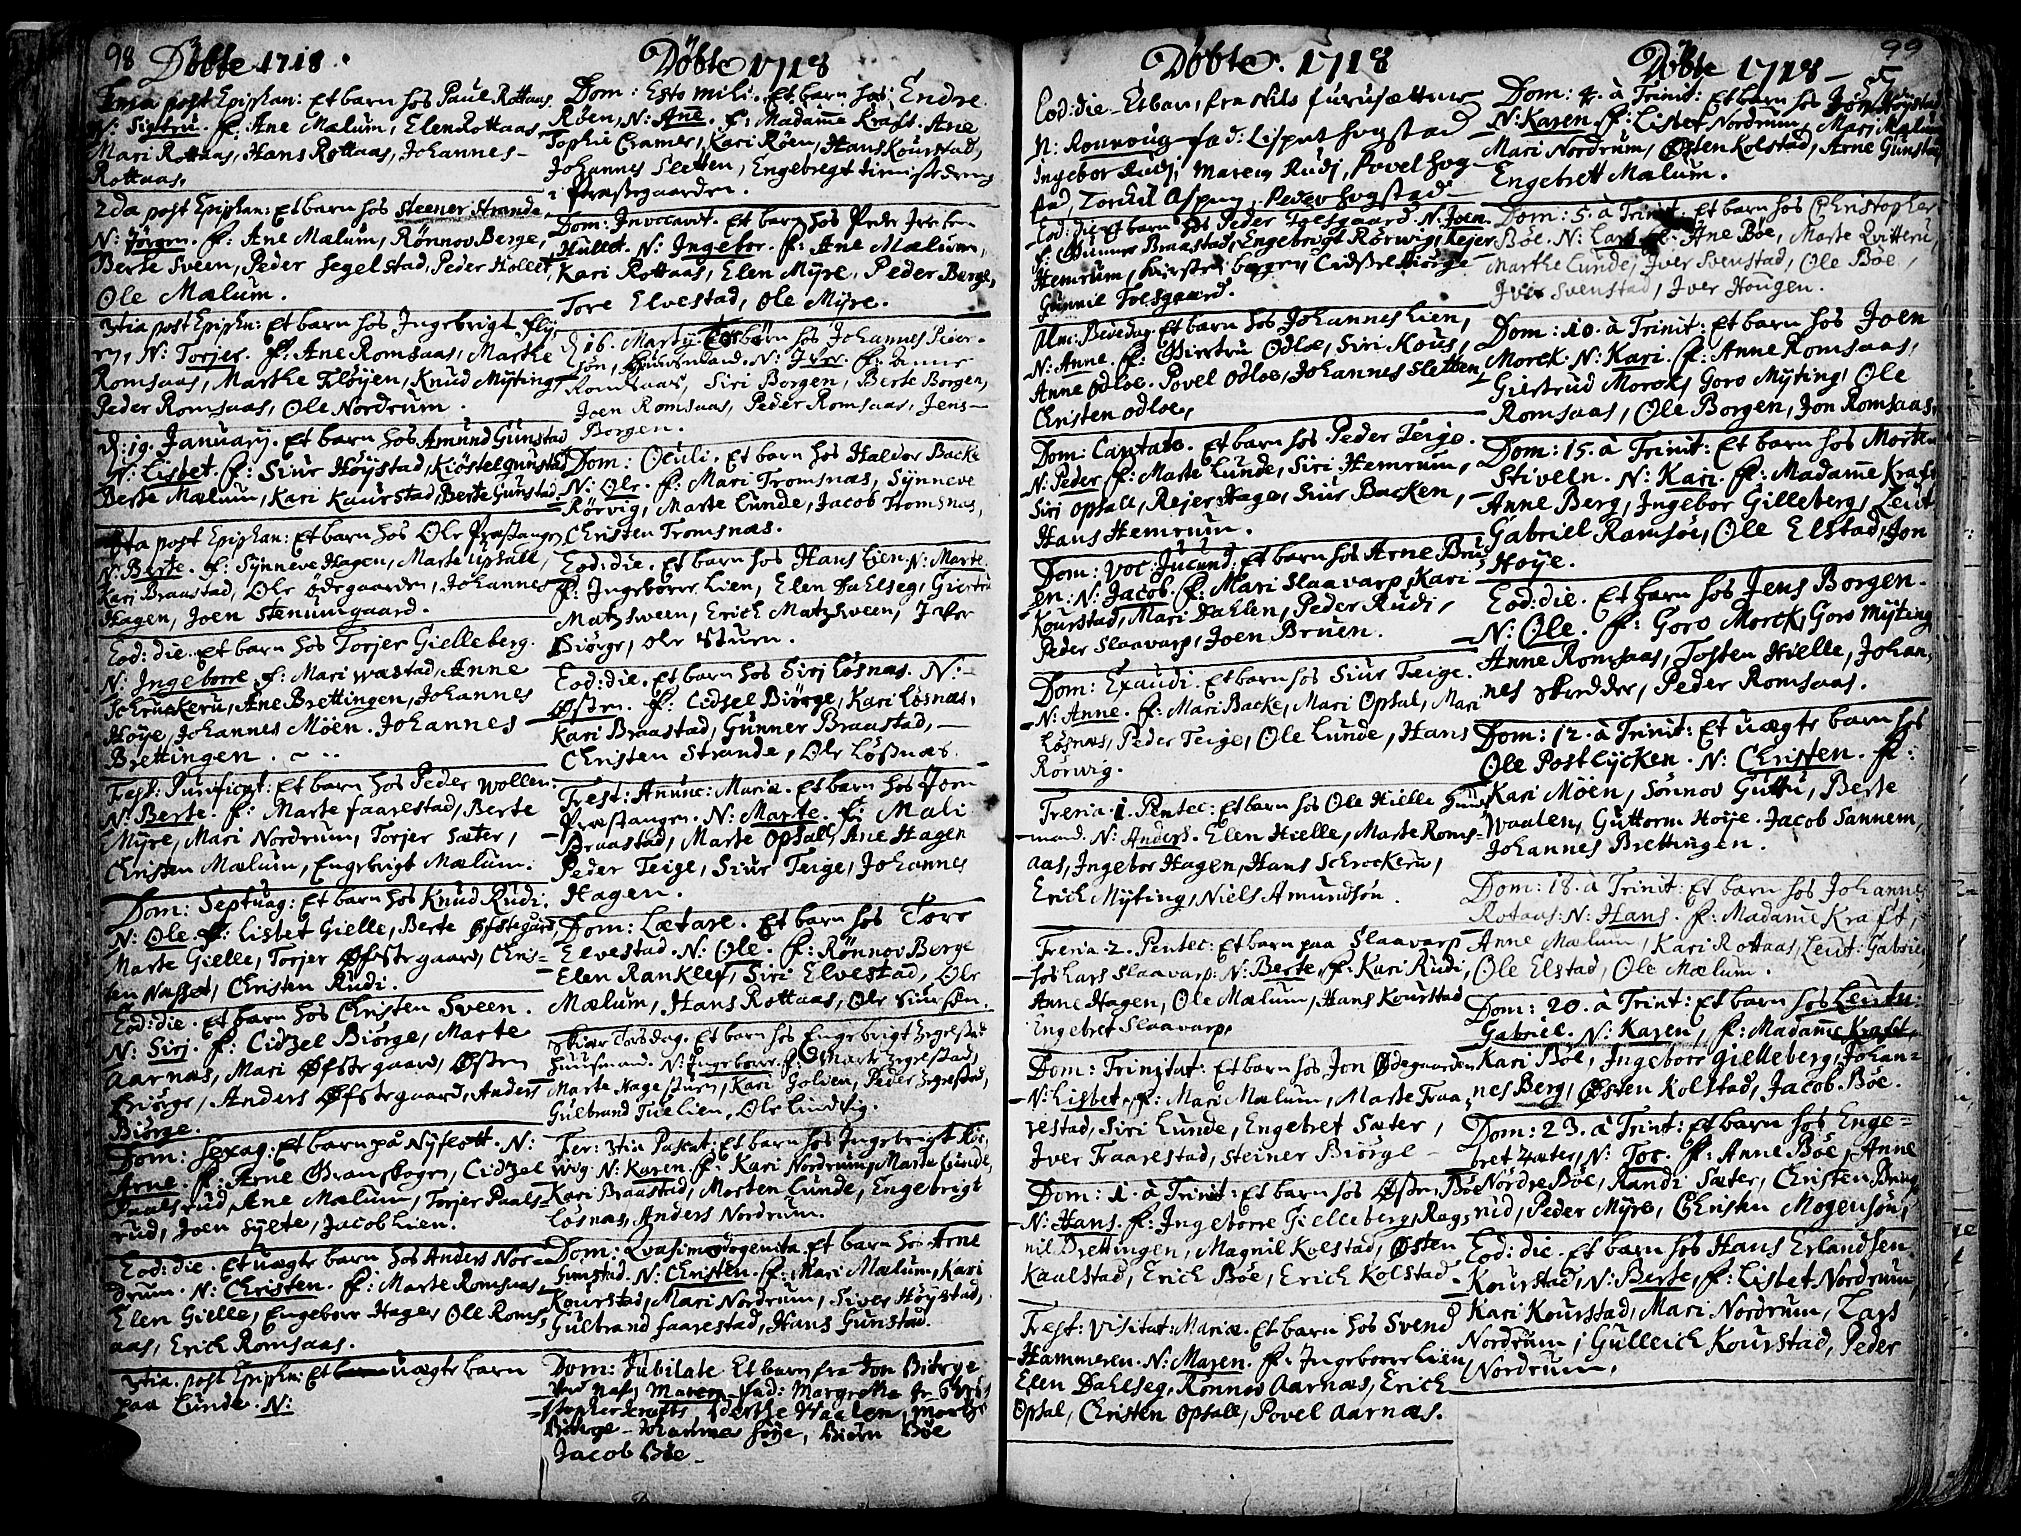 SAH, Ringebu prestekontor, Ministerialbok nr. 1, 1696-1733, s. 98-99